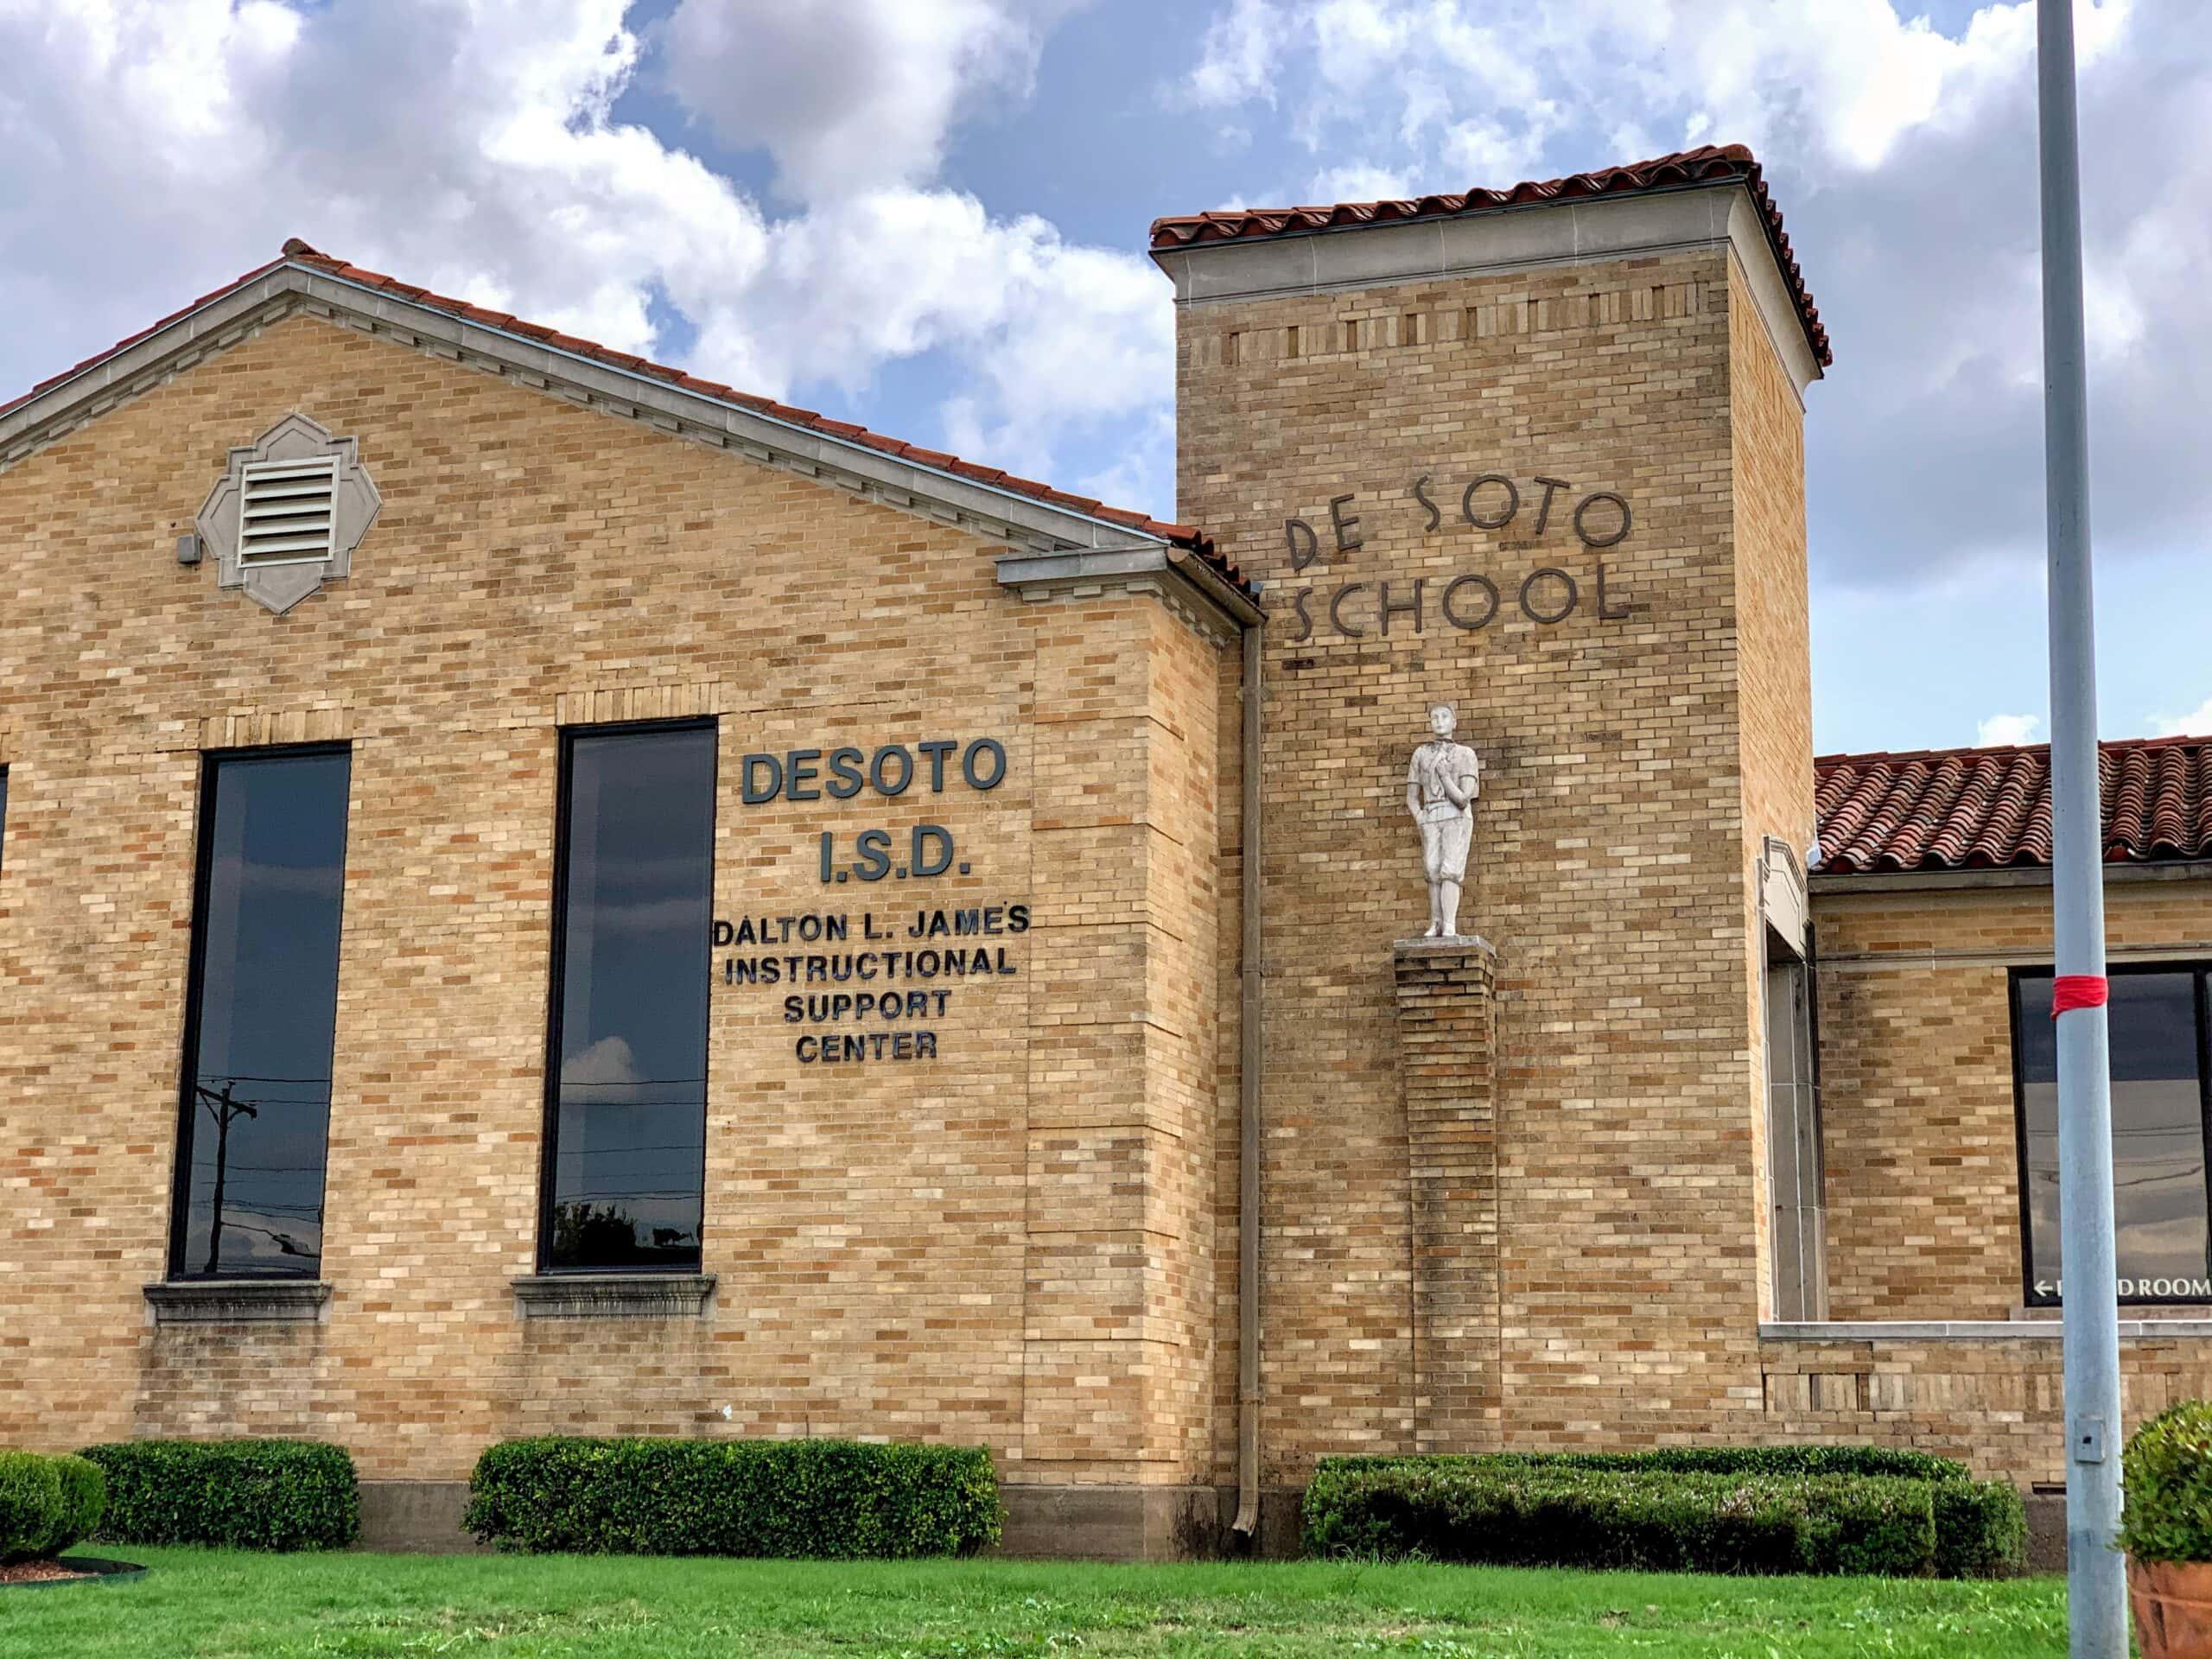 DeSoto ISD Building